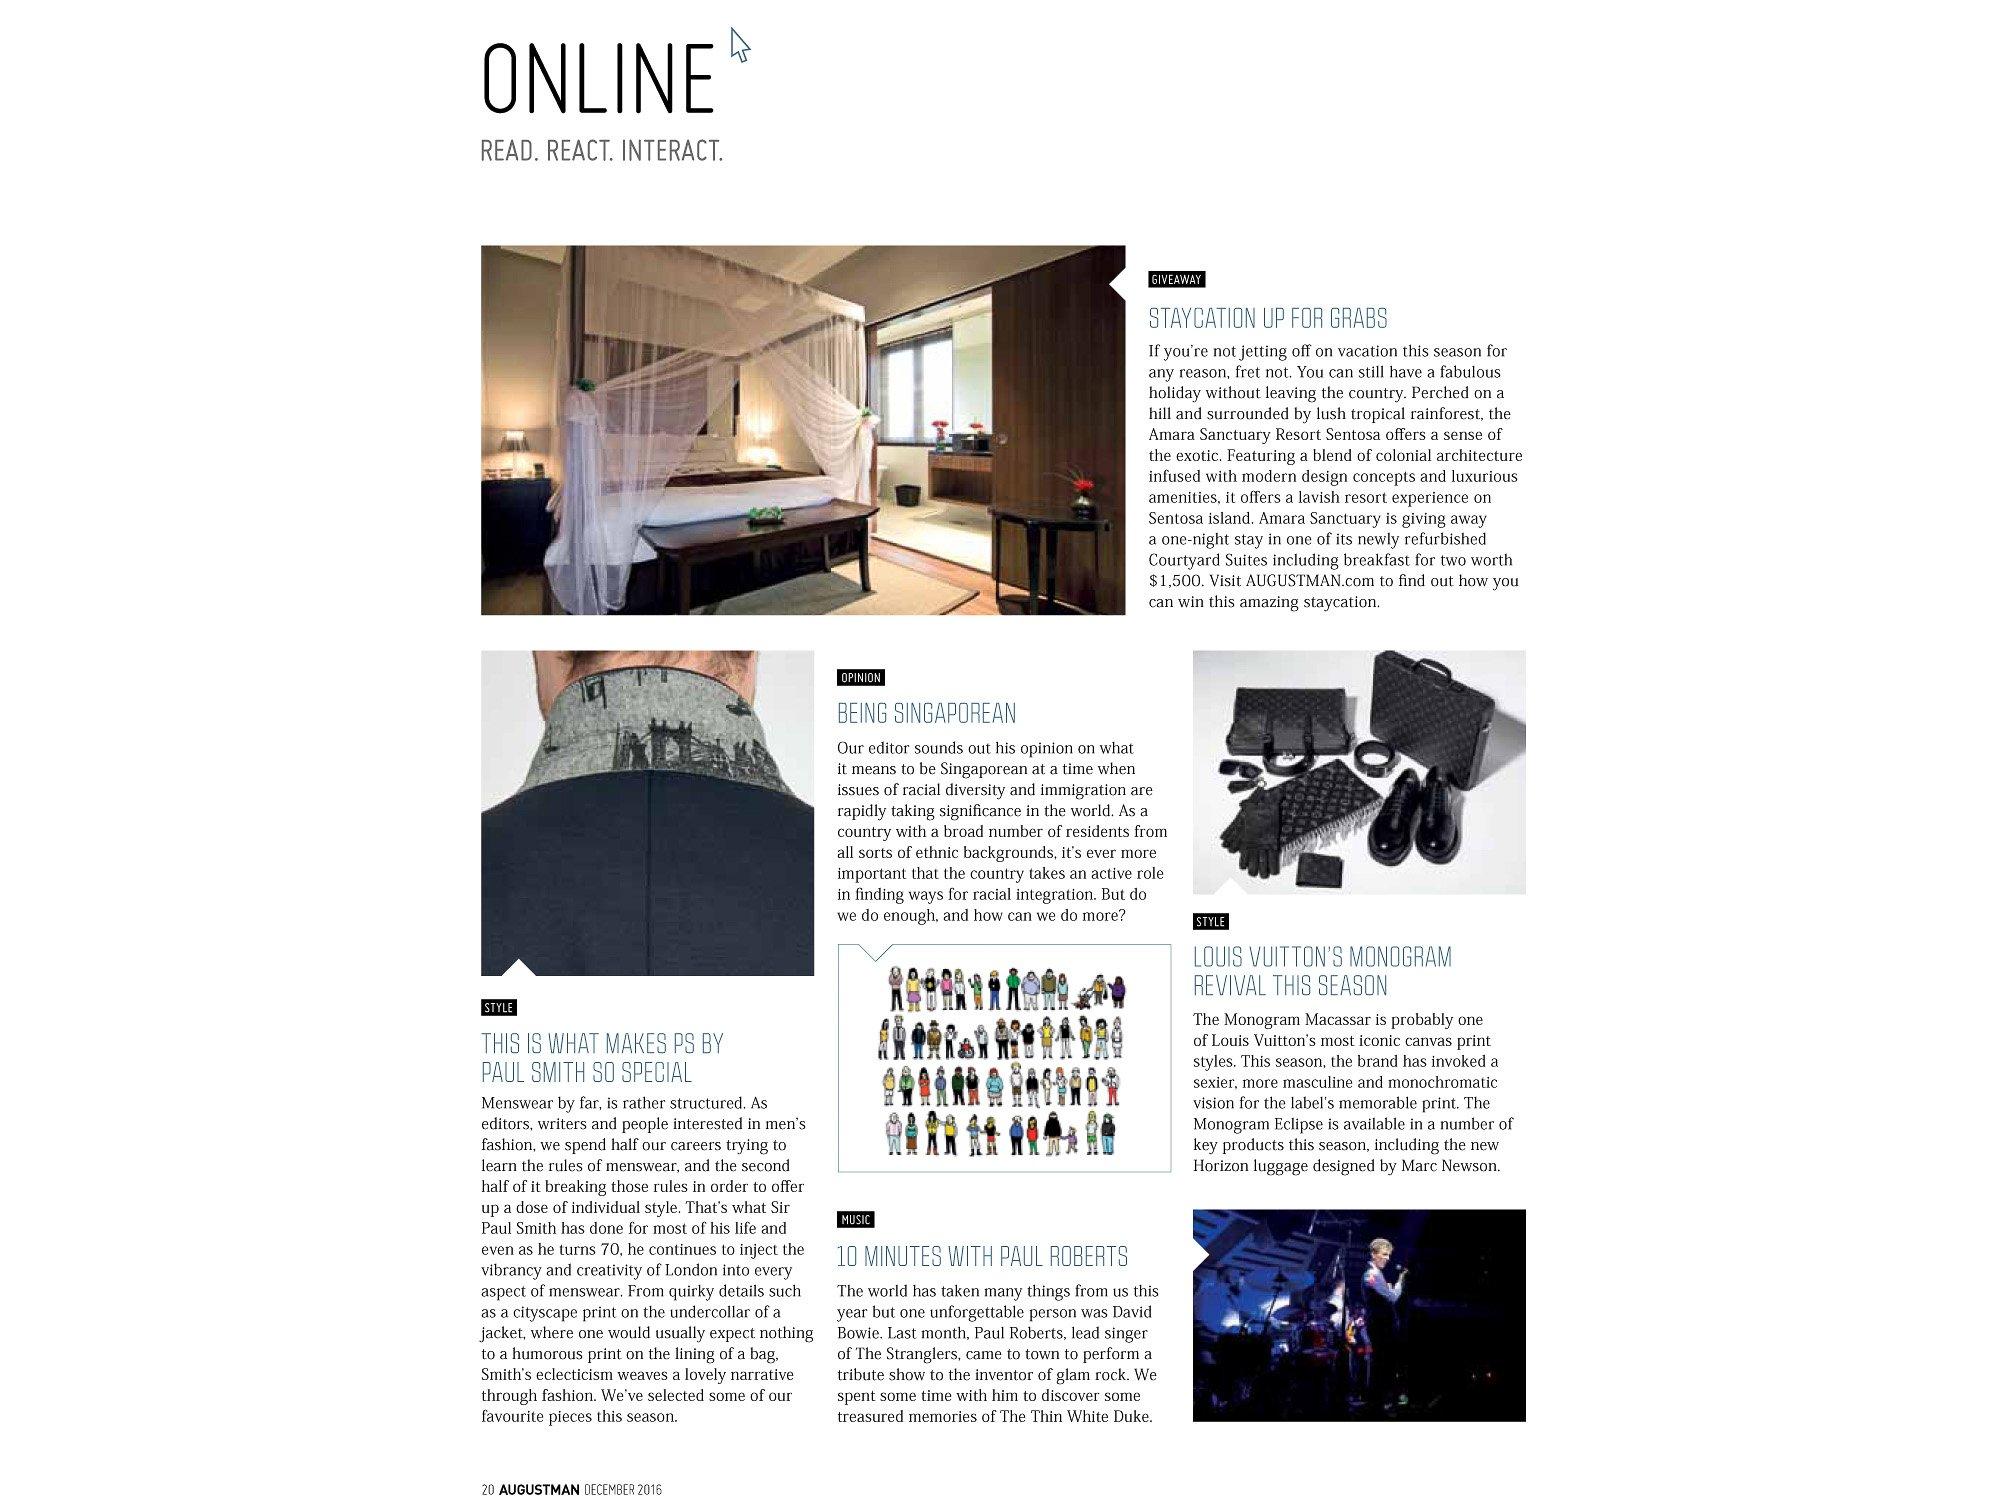 AUGUSTMAN magazine singapore jose jeuland paul roberts concert